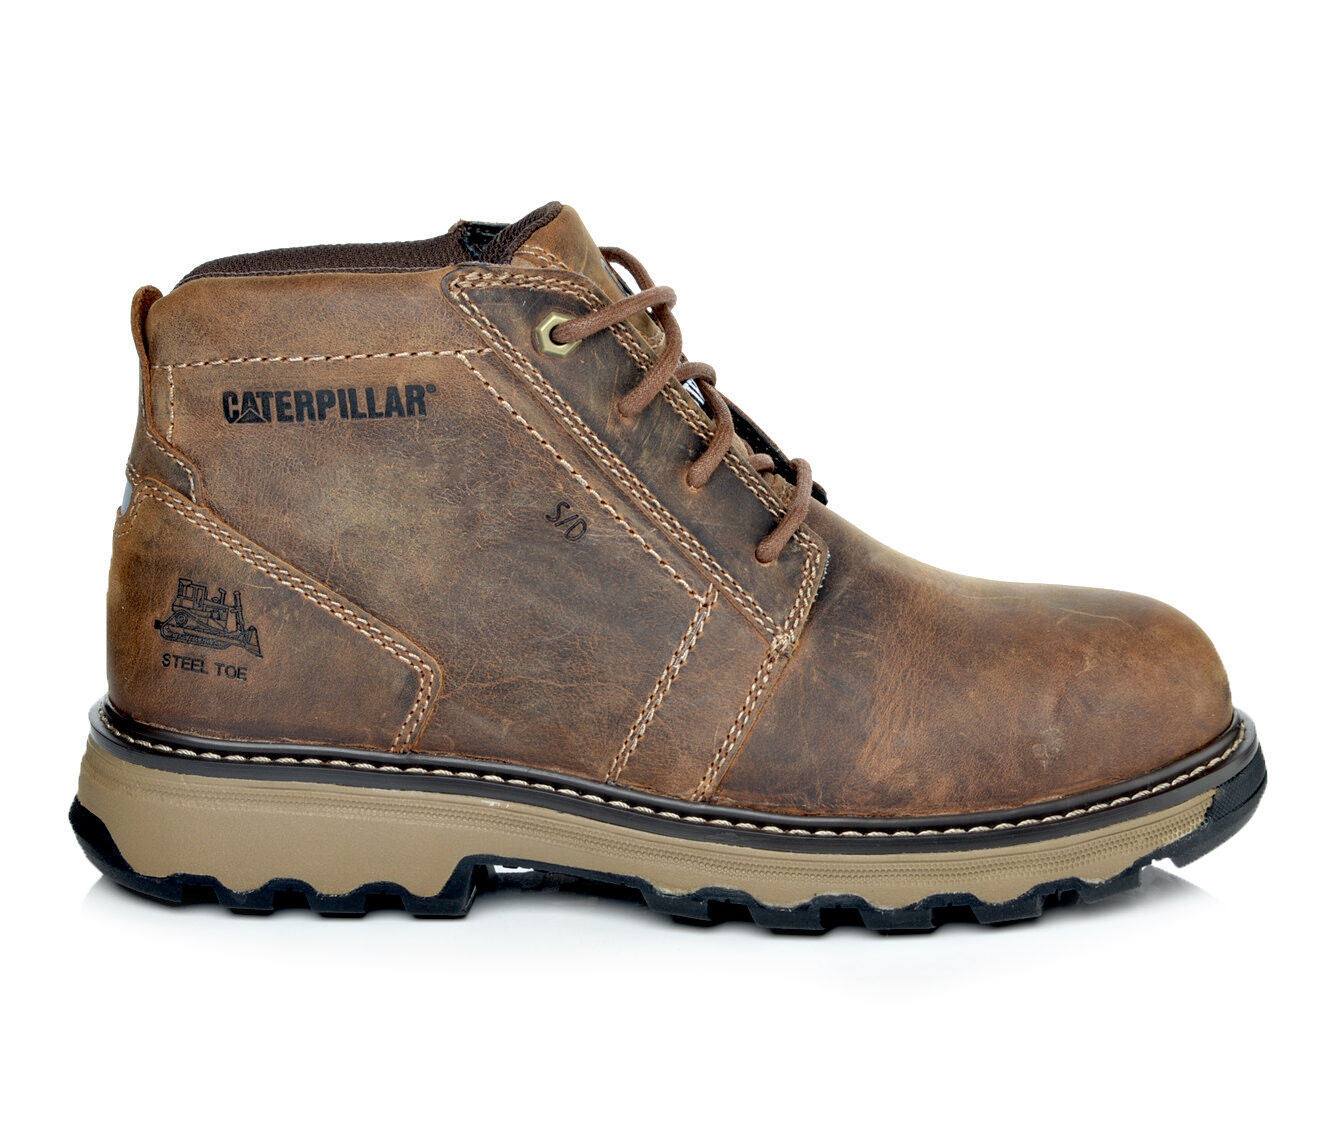 Men's Caterpillar Parker ESD Steel Toe Work Boots